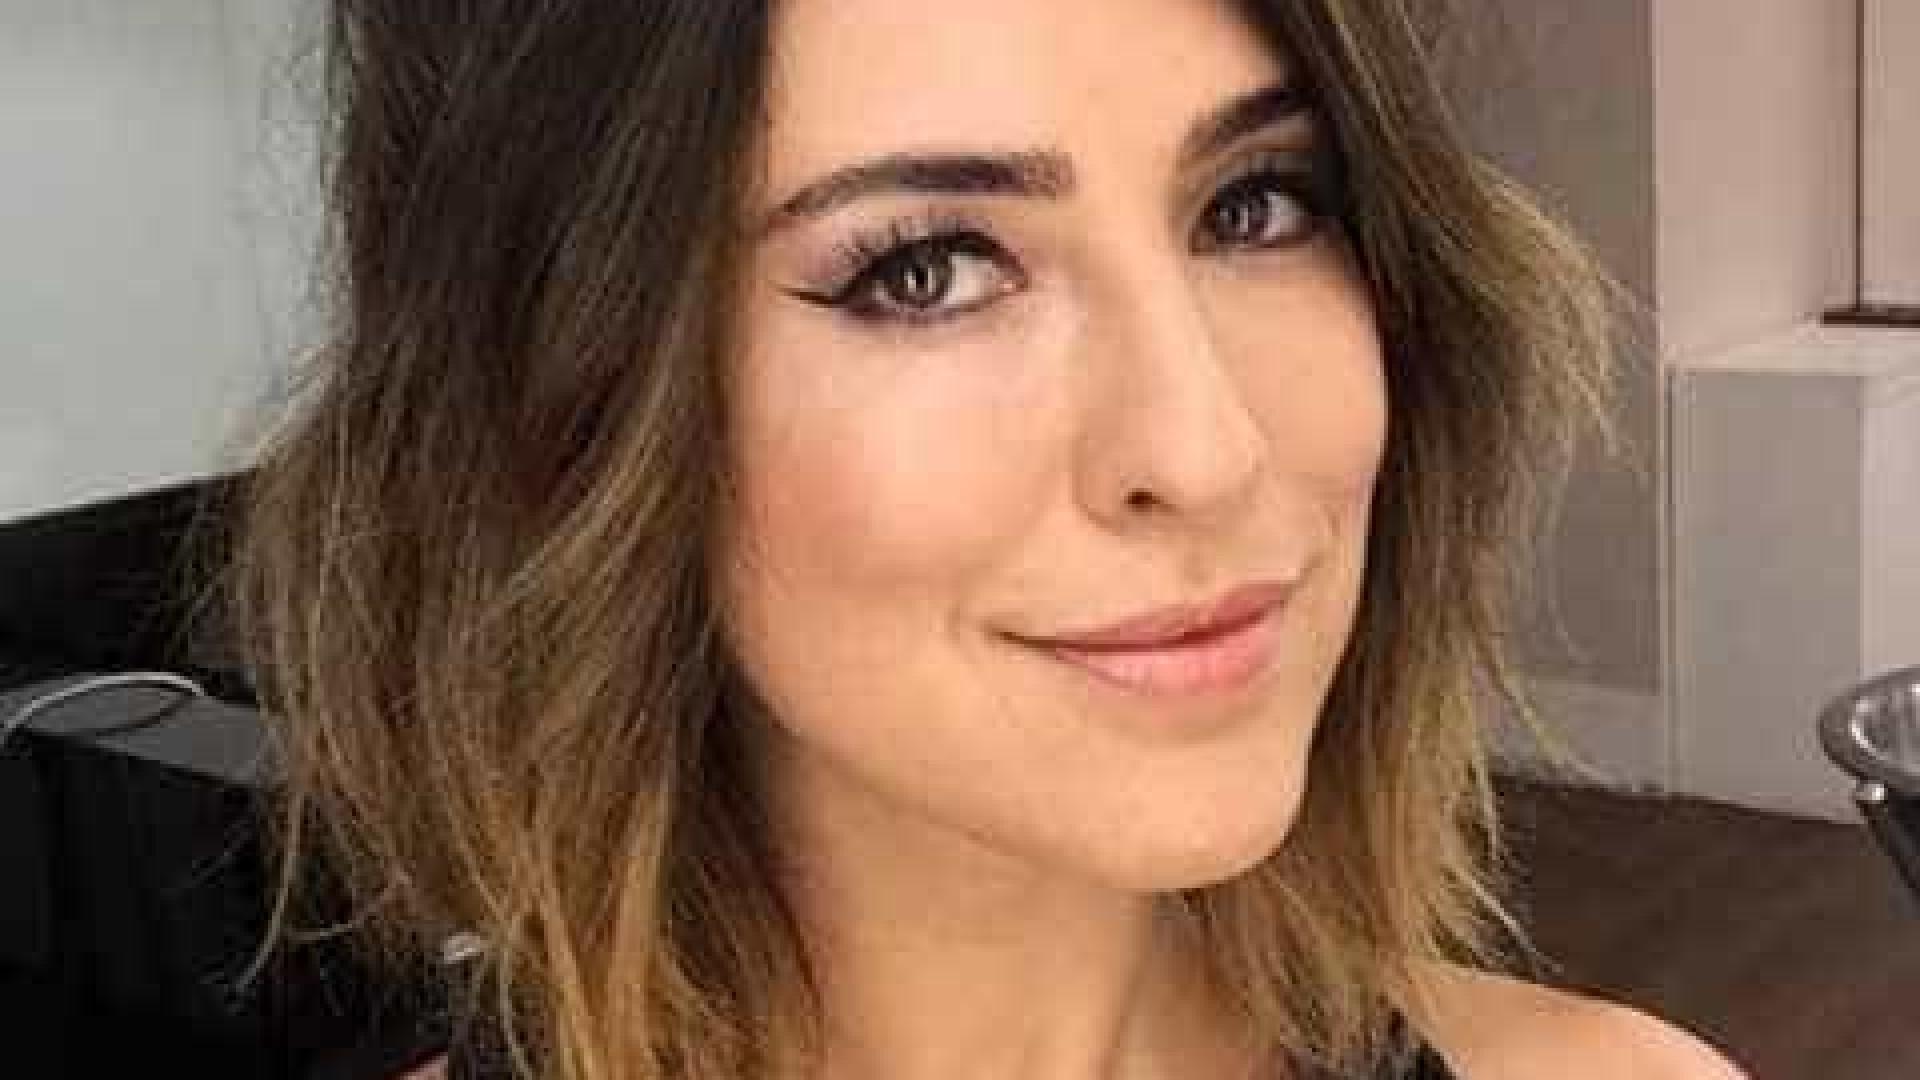 Fernanda Paes Leme muda look após deixar a Globo